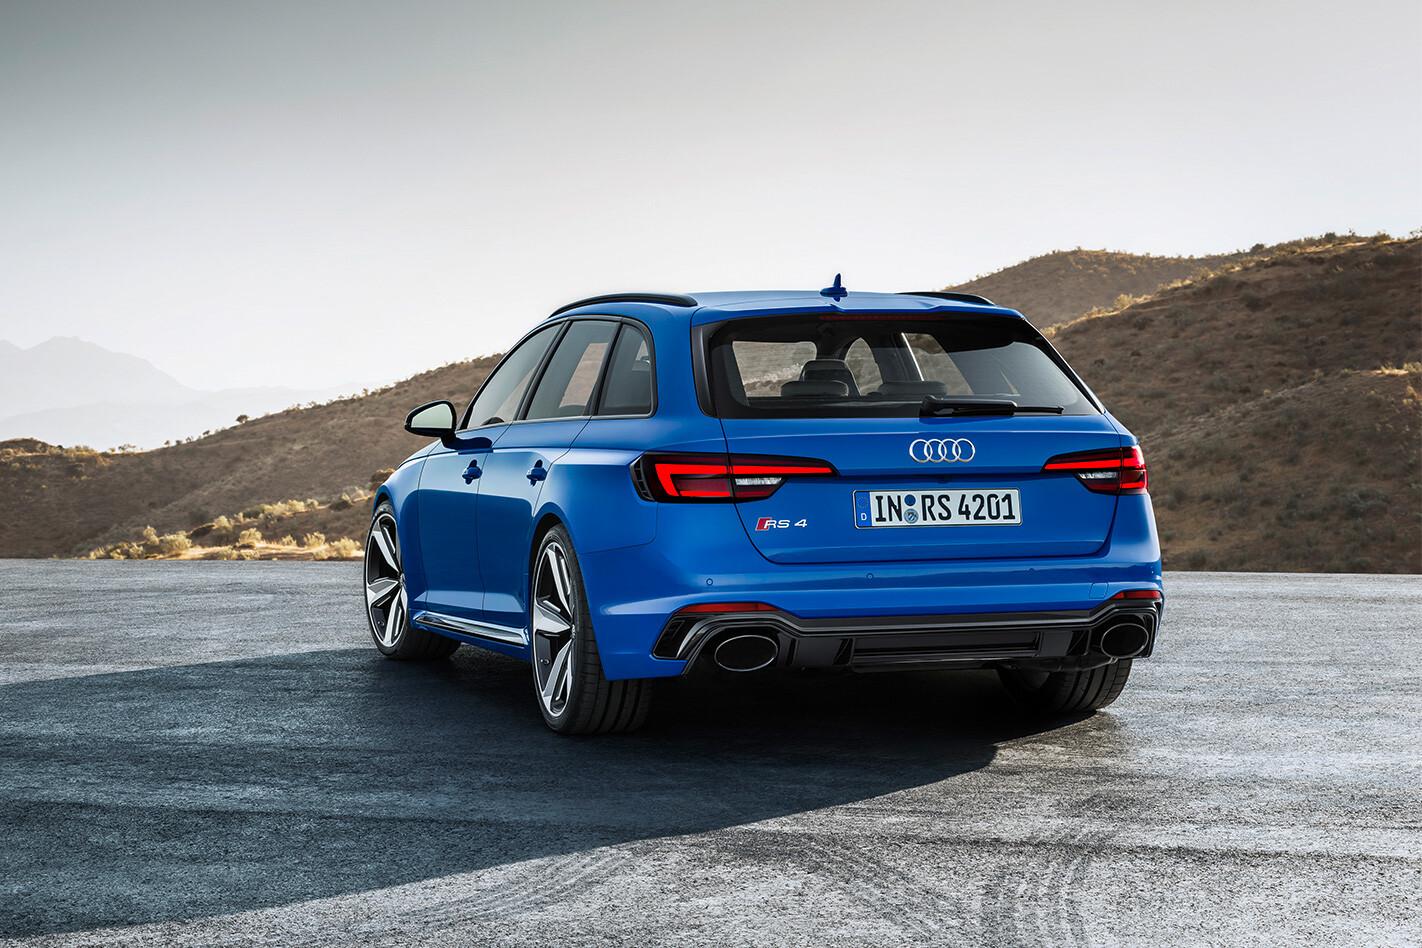 2018 Audi RS4 Avant rear